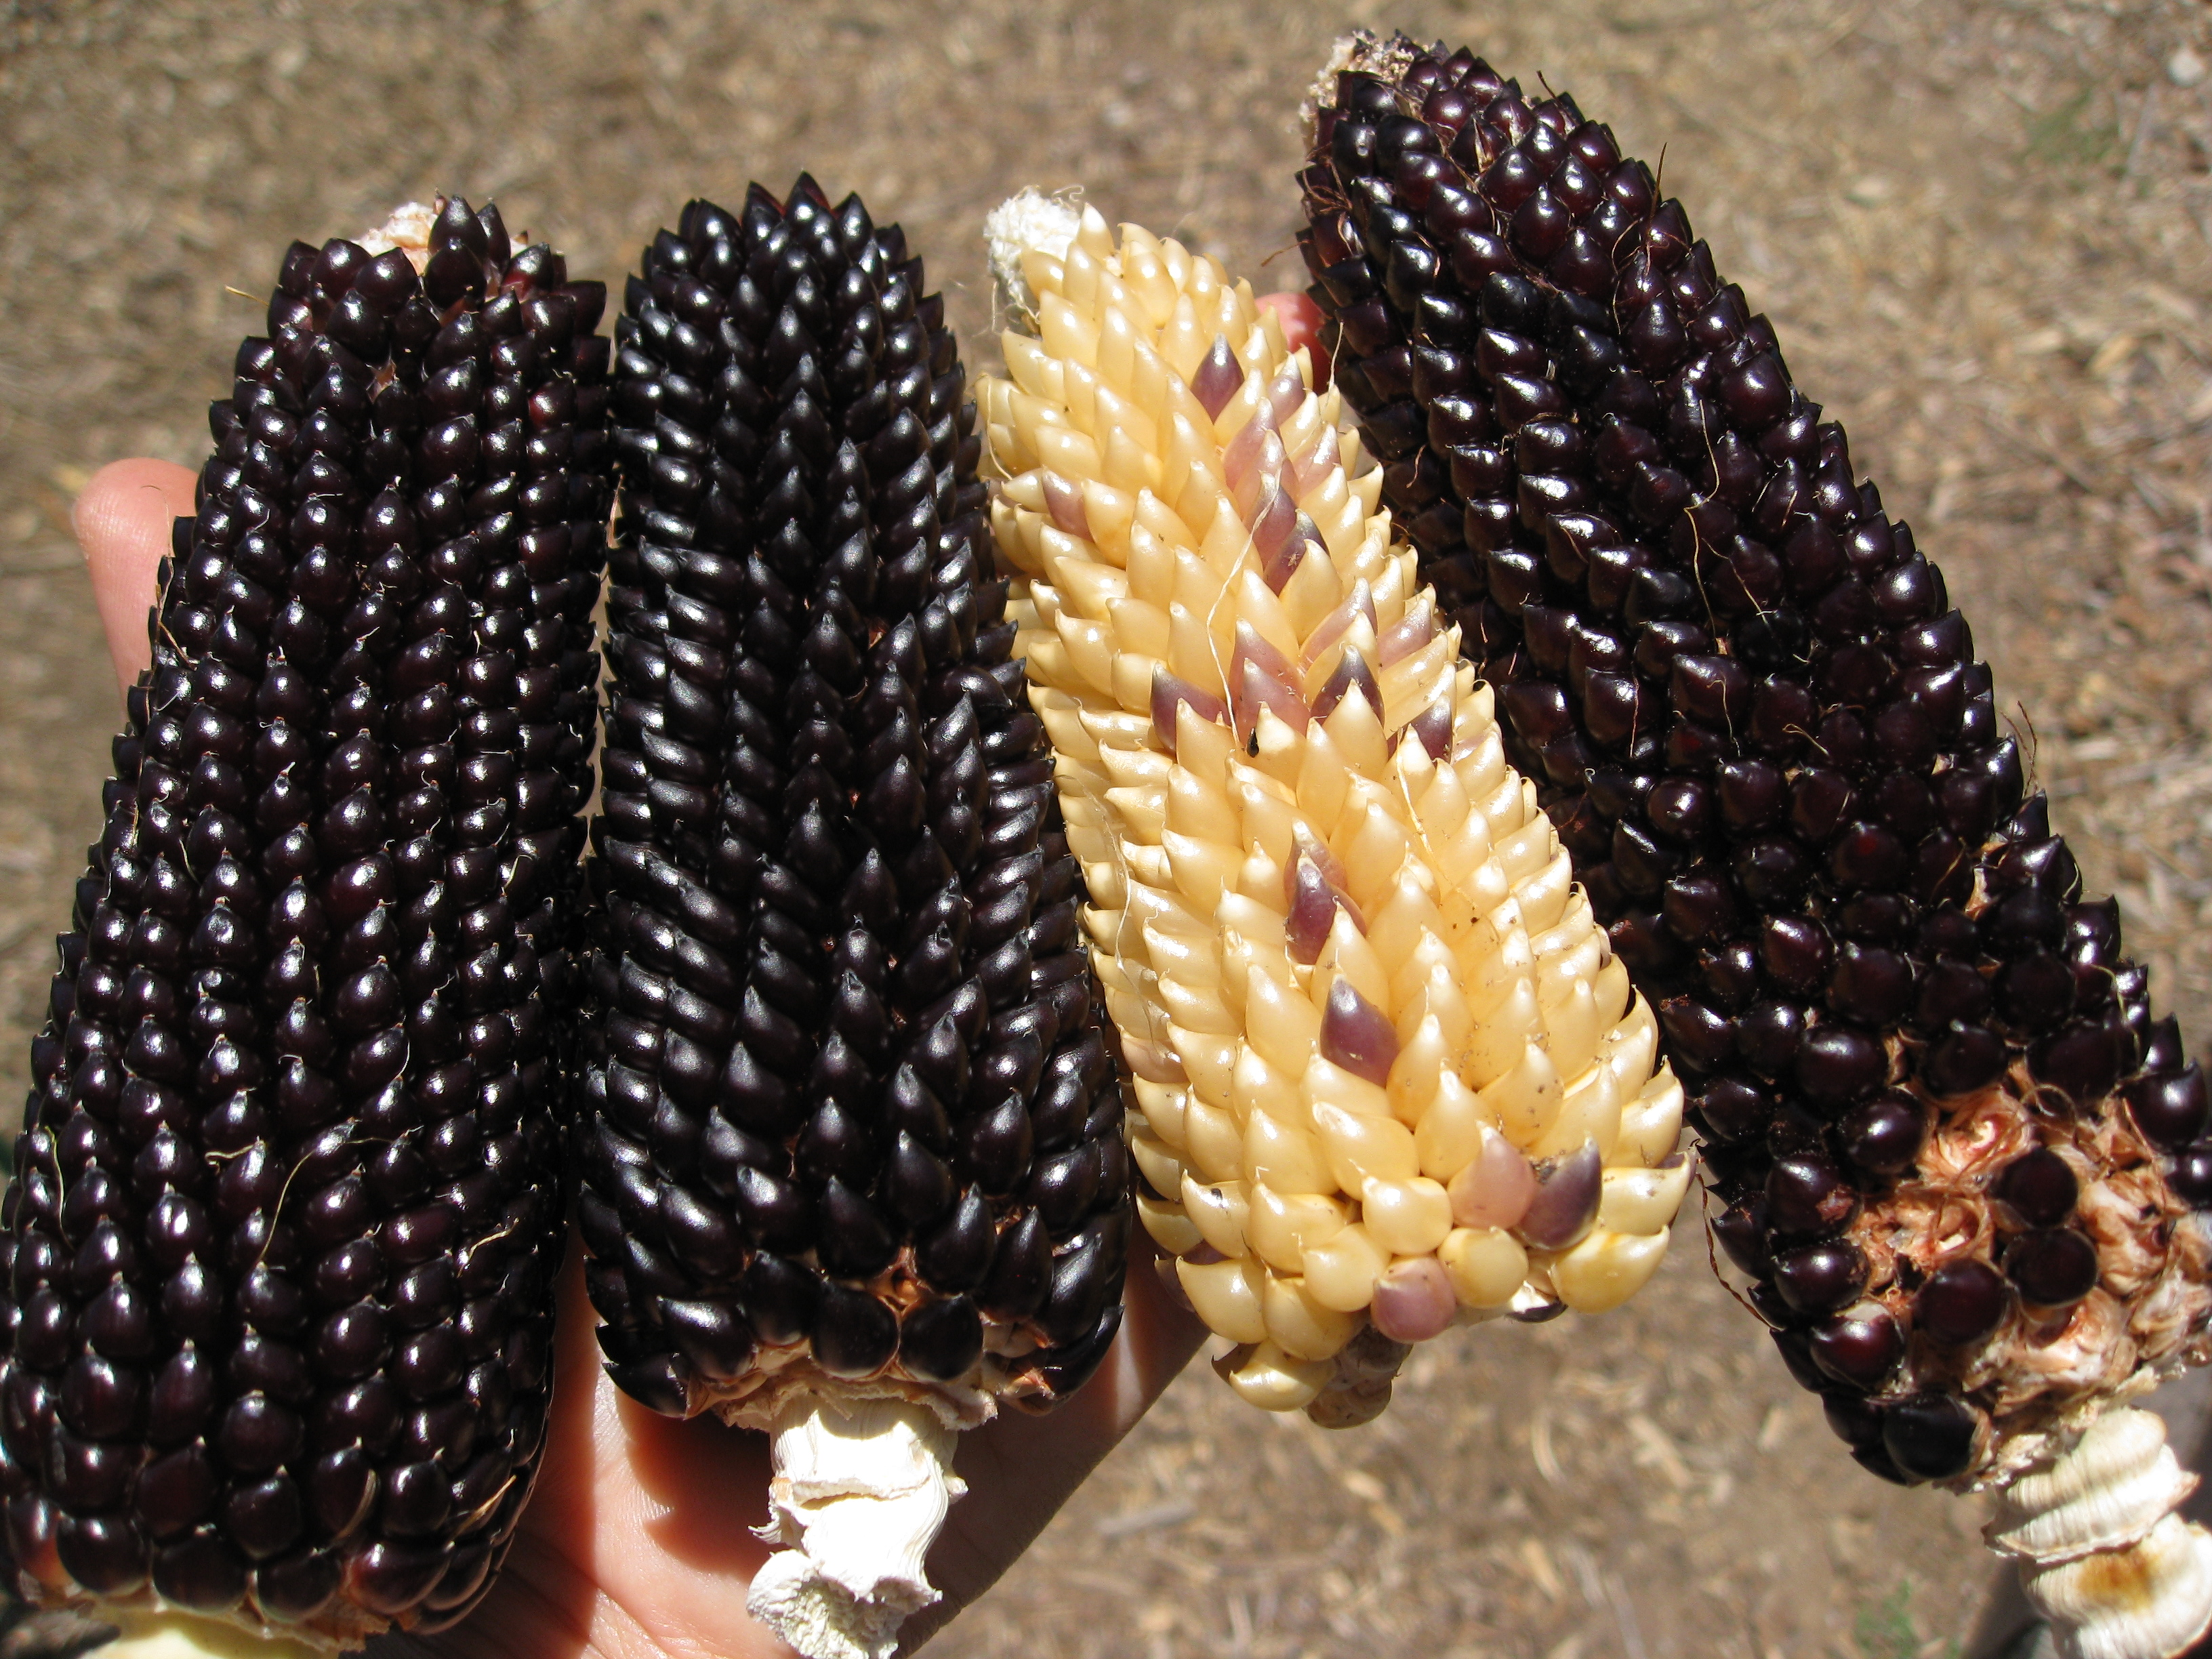 Harvesting Black Dakota Popping Corn Gardenerd